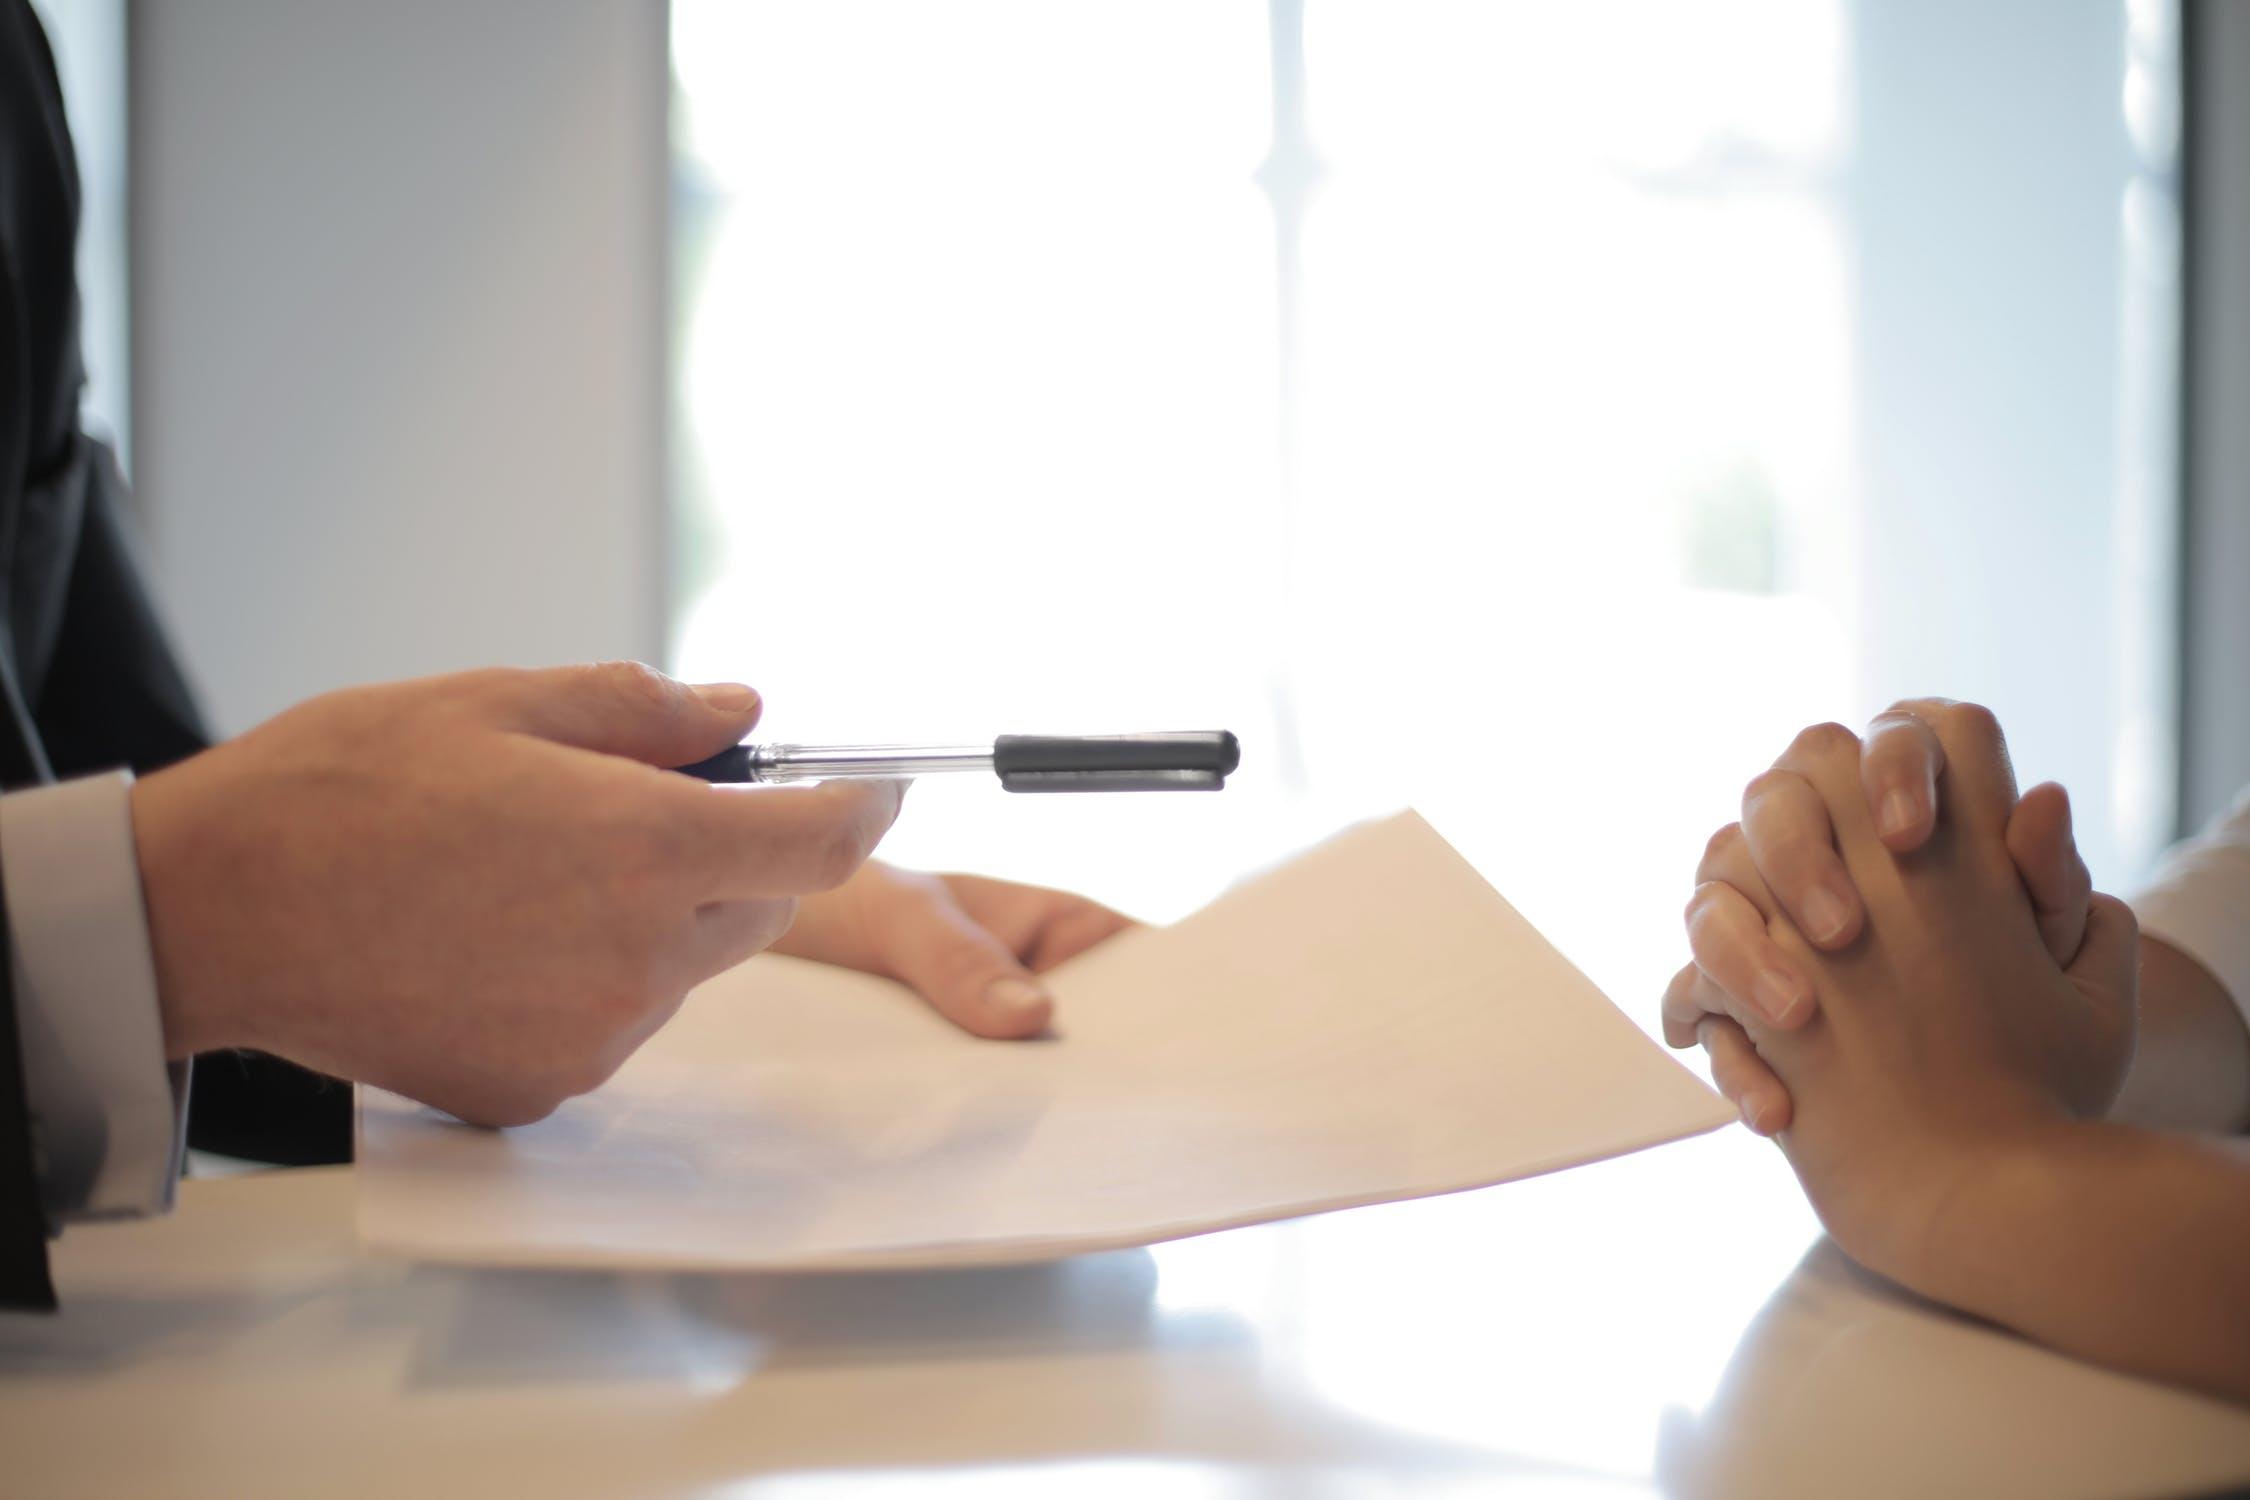 zakelijke lening afsluiten